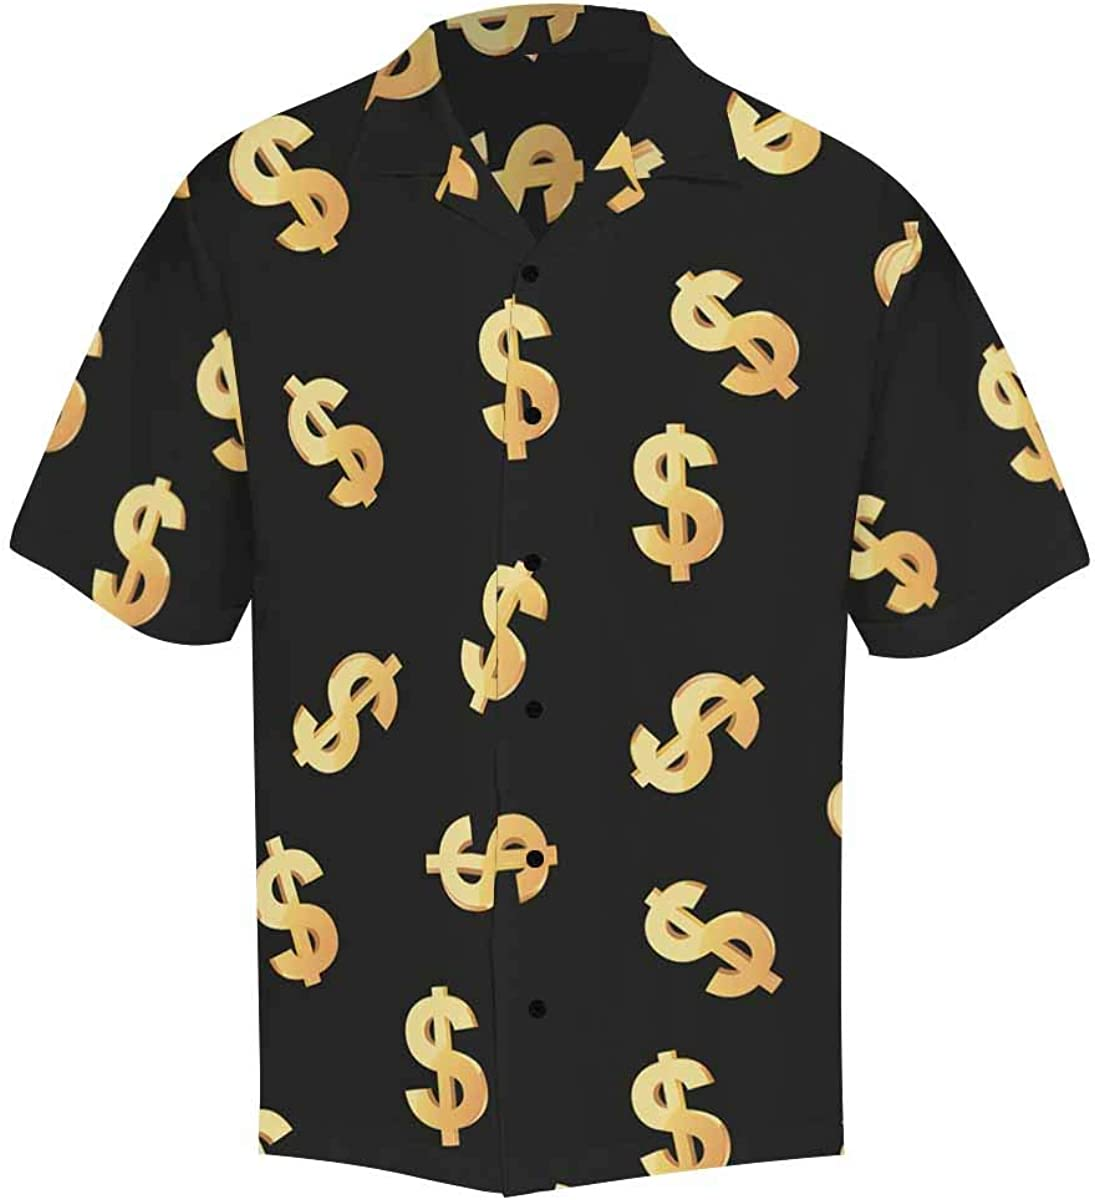 InterestPrint Men's Casual Button Down Short Sleeve Funny Dog Hawaiian Shirt (S-5XL)